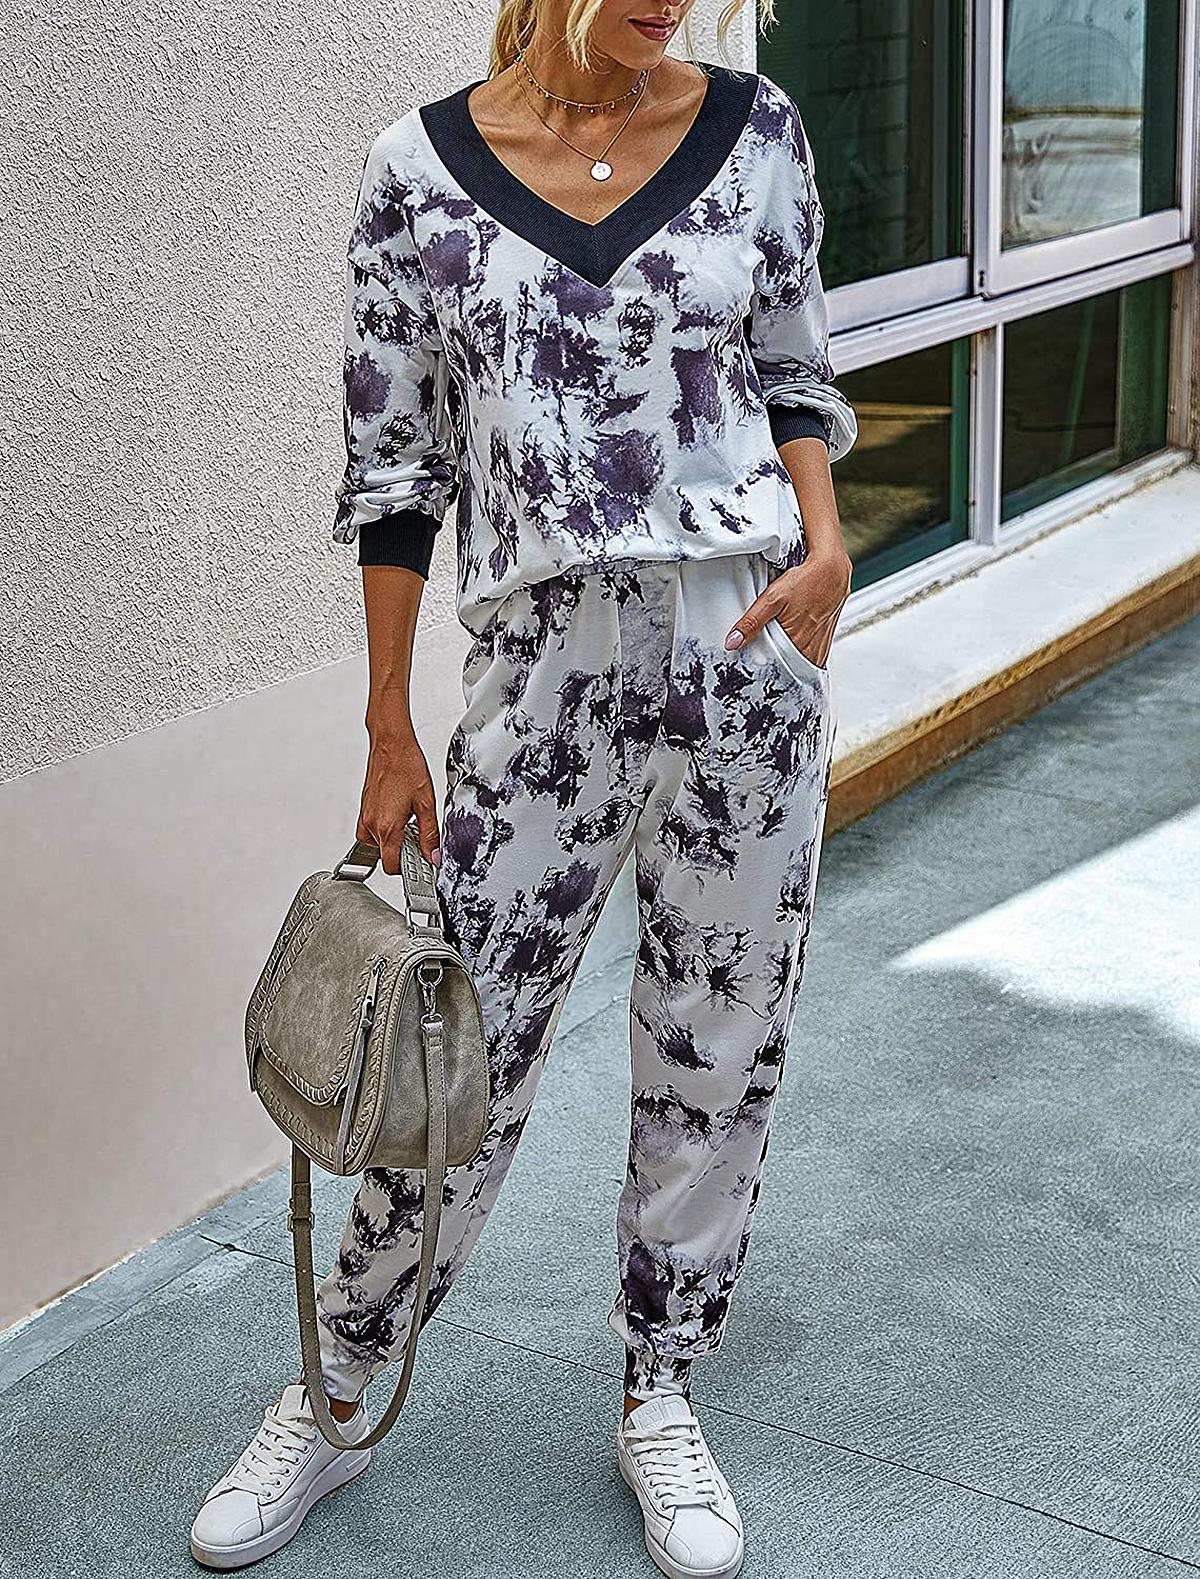 BTFBM Leopard Print/Tie-Dye 2-Piece Pajamas